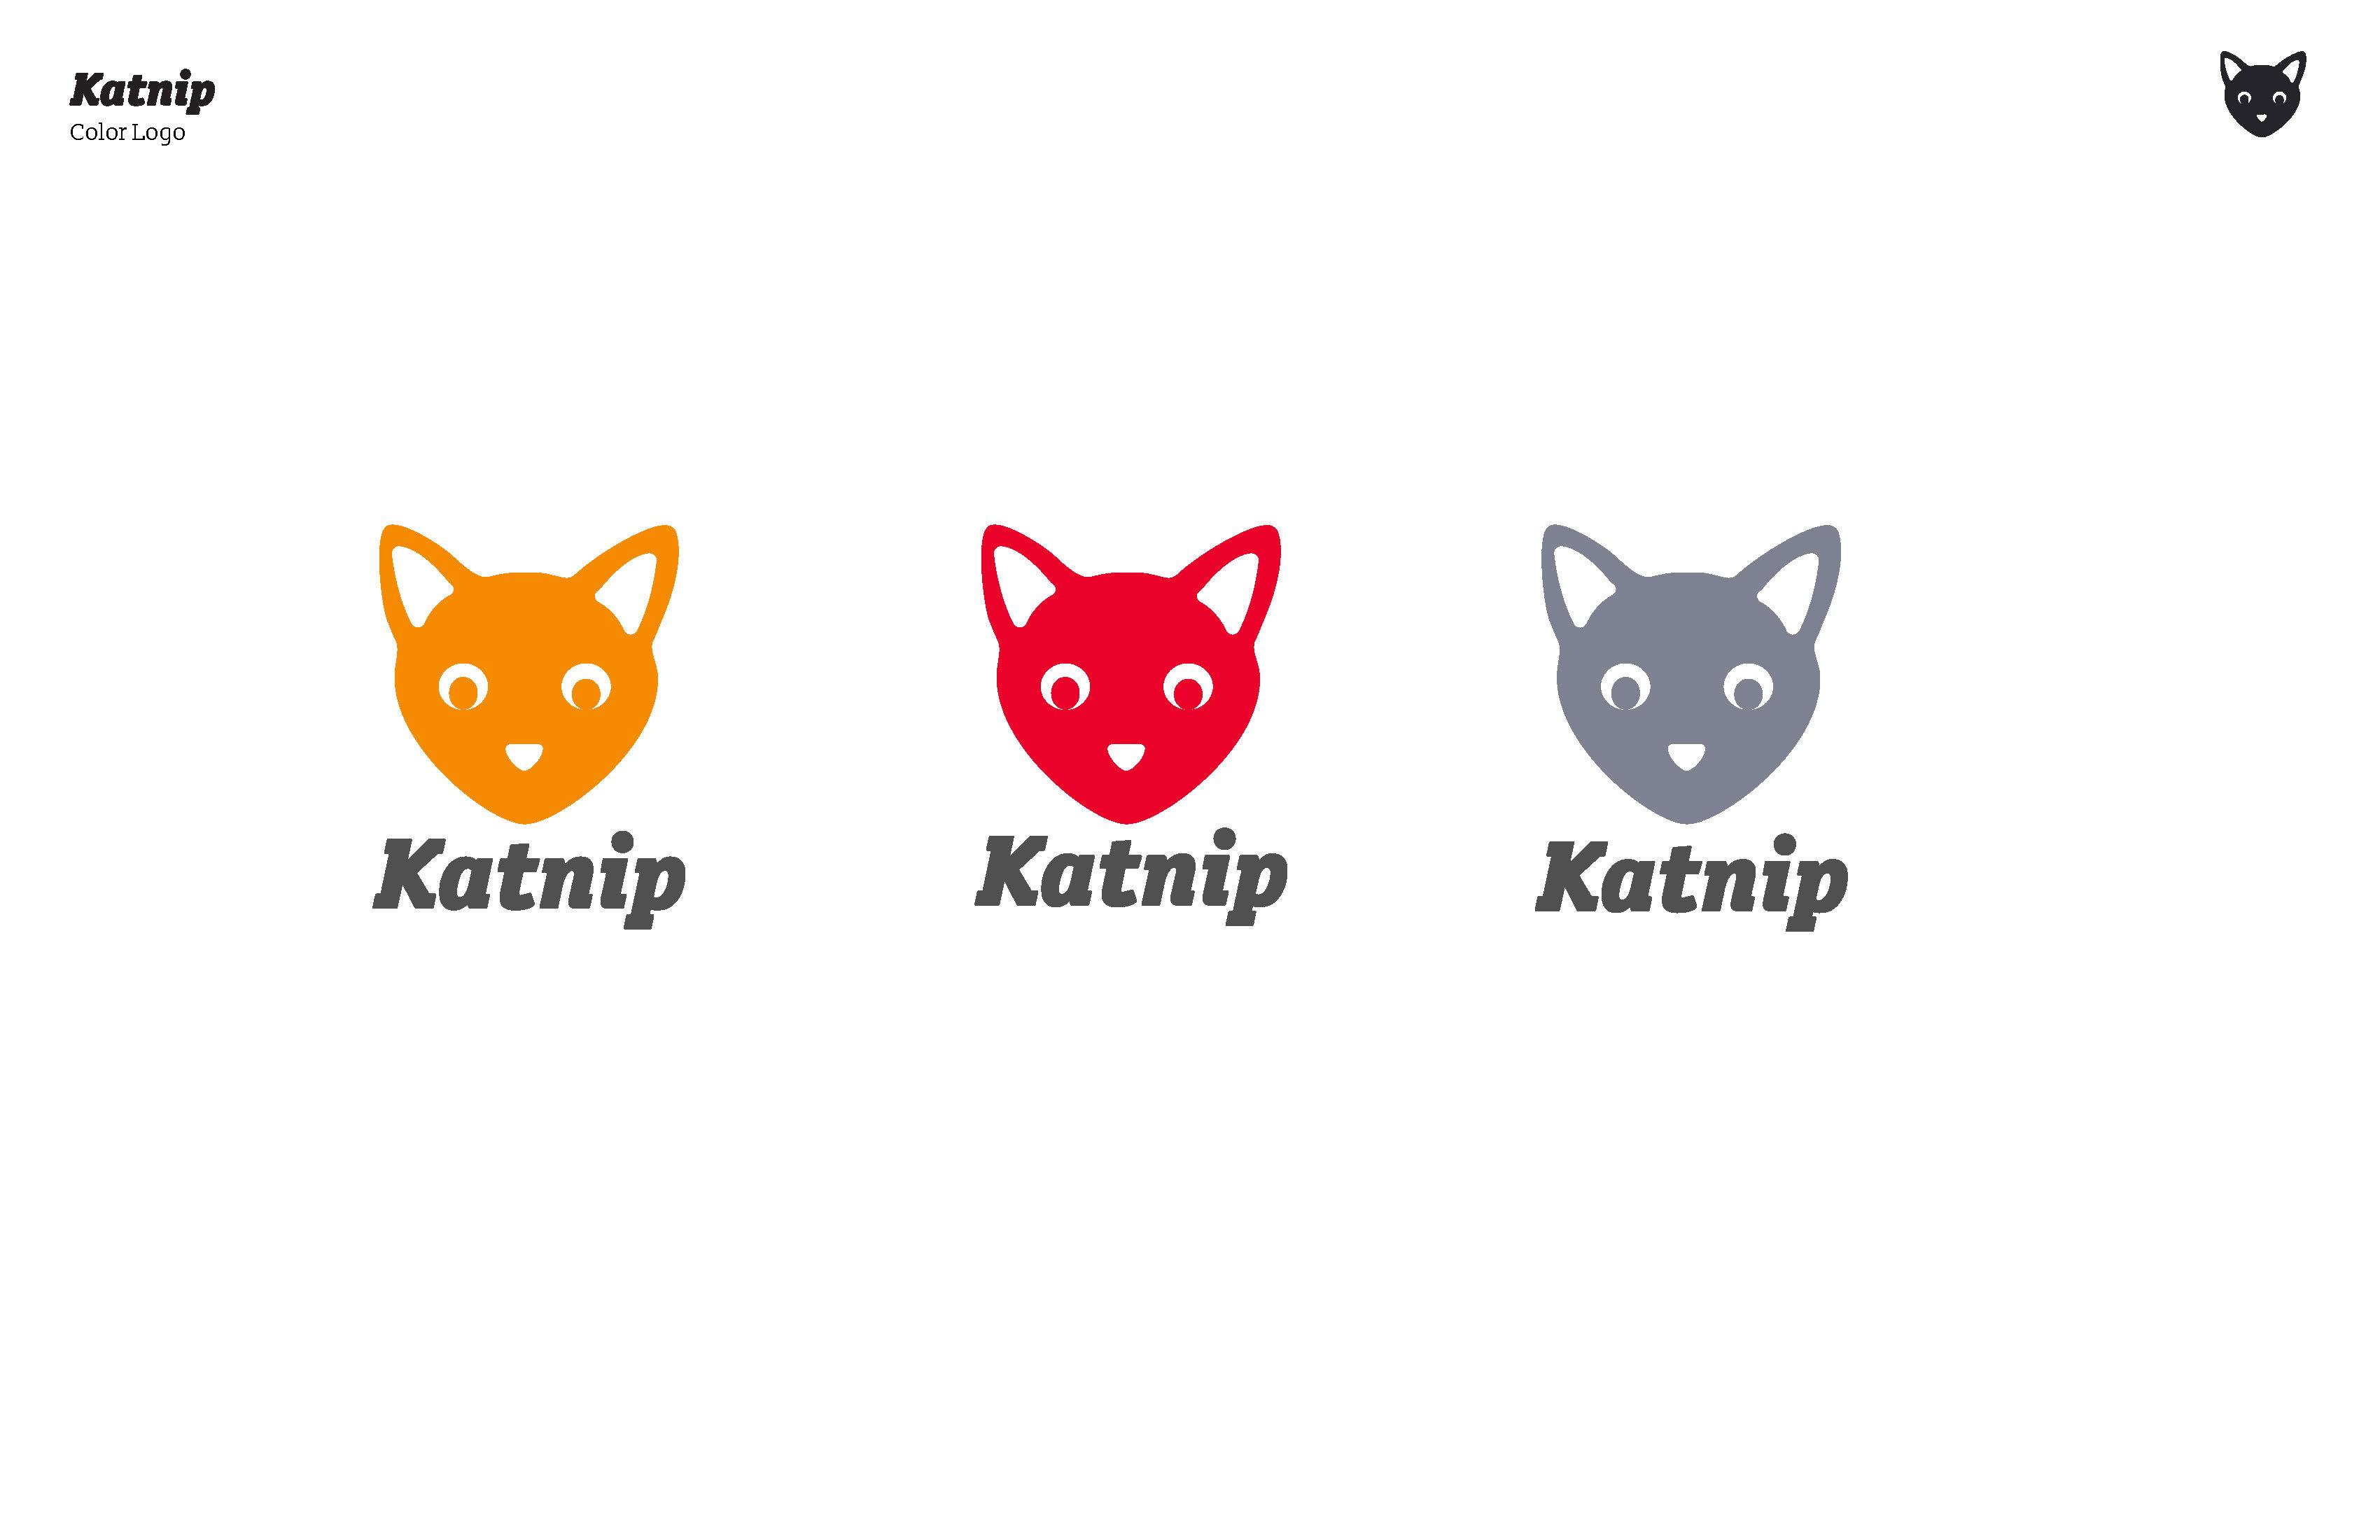 KatnipCaseStudy_Page_04